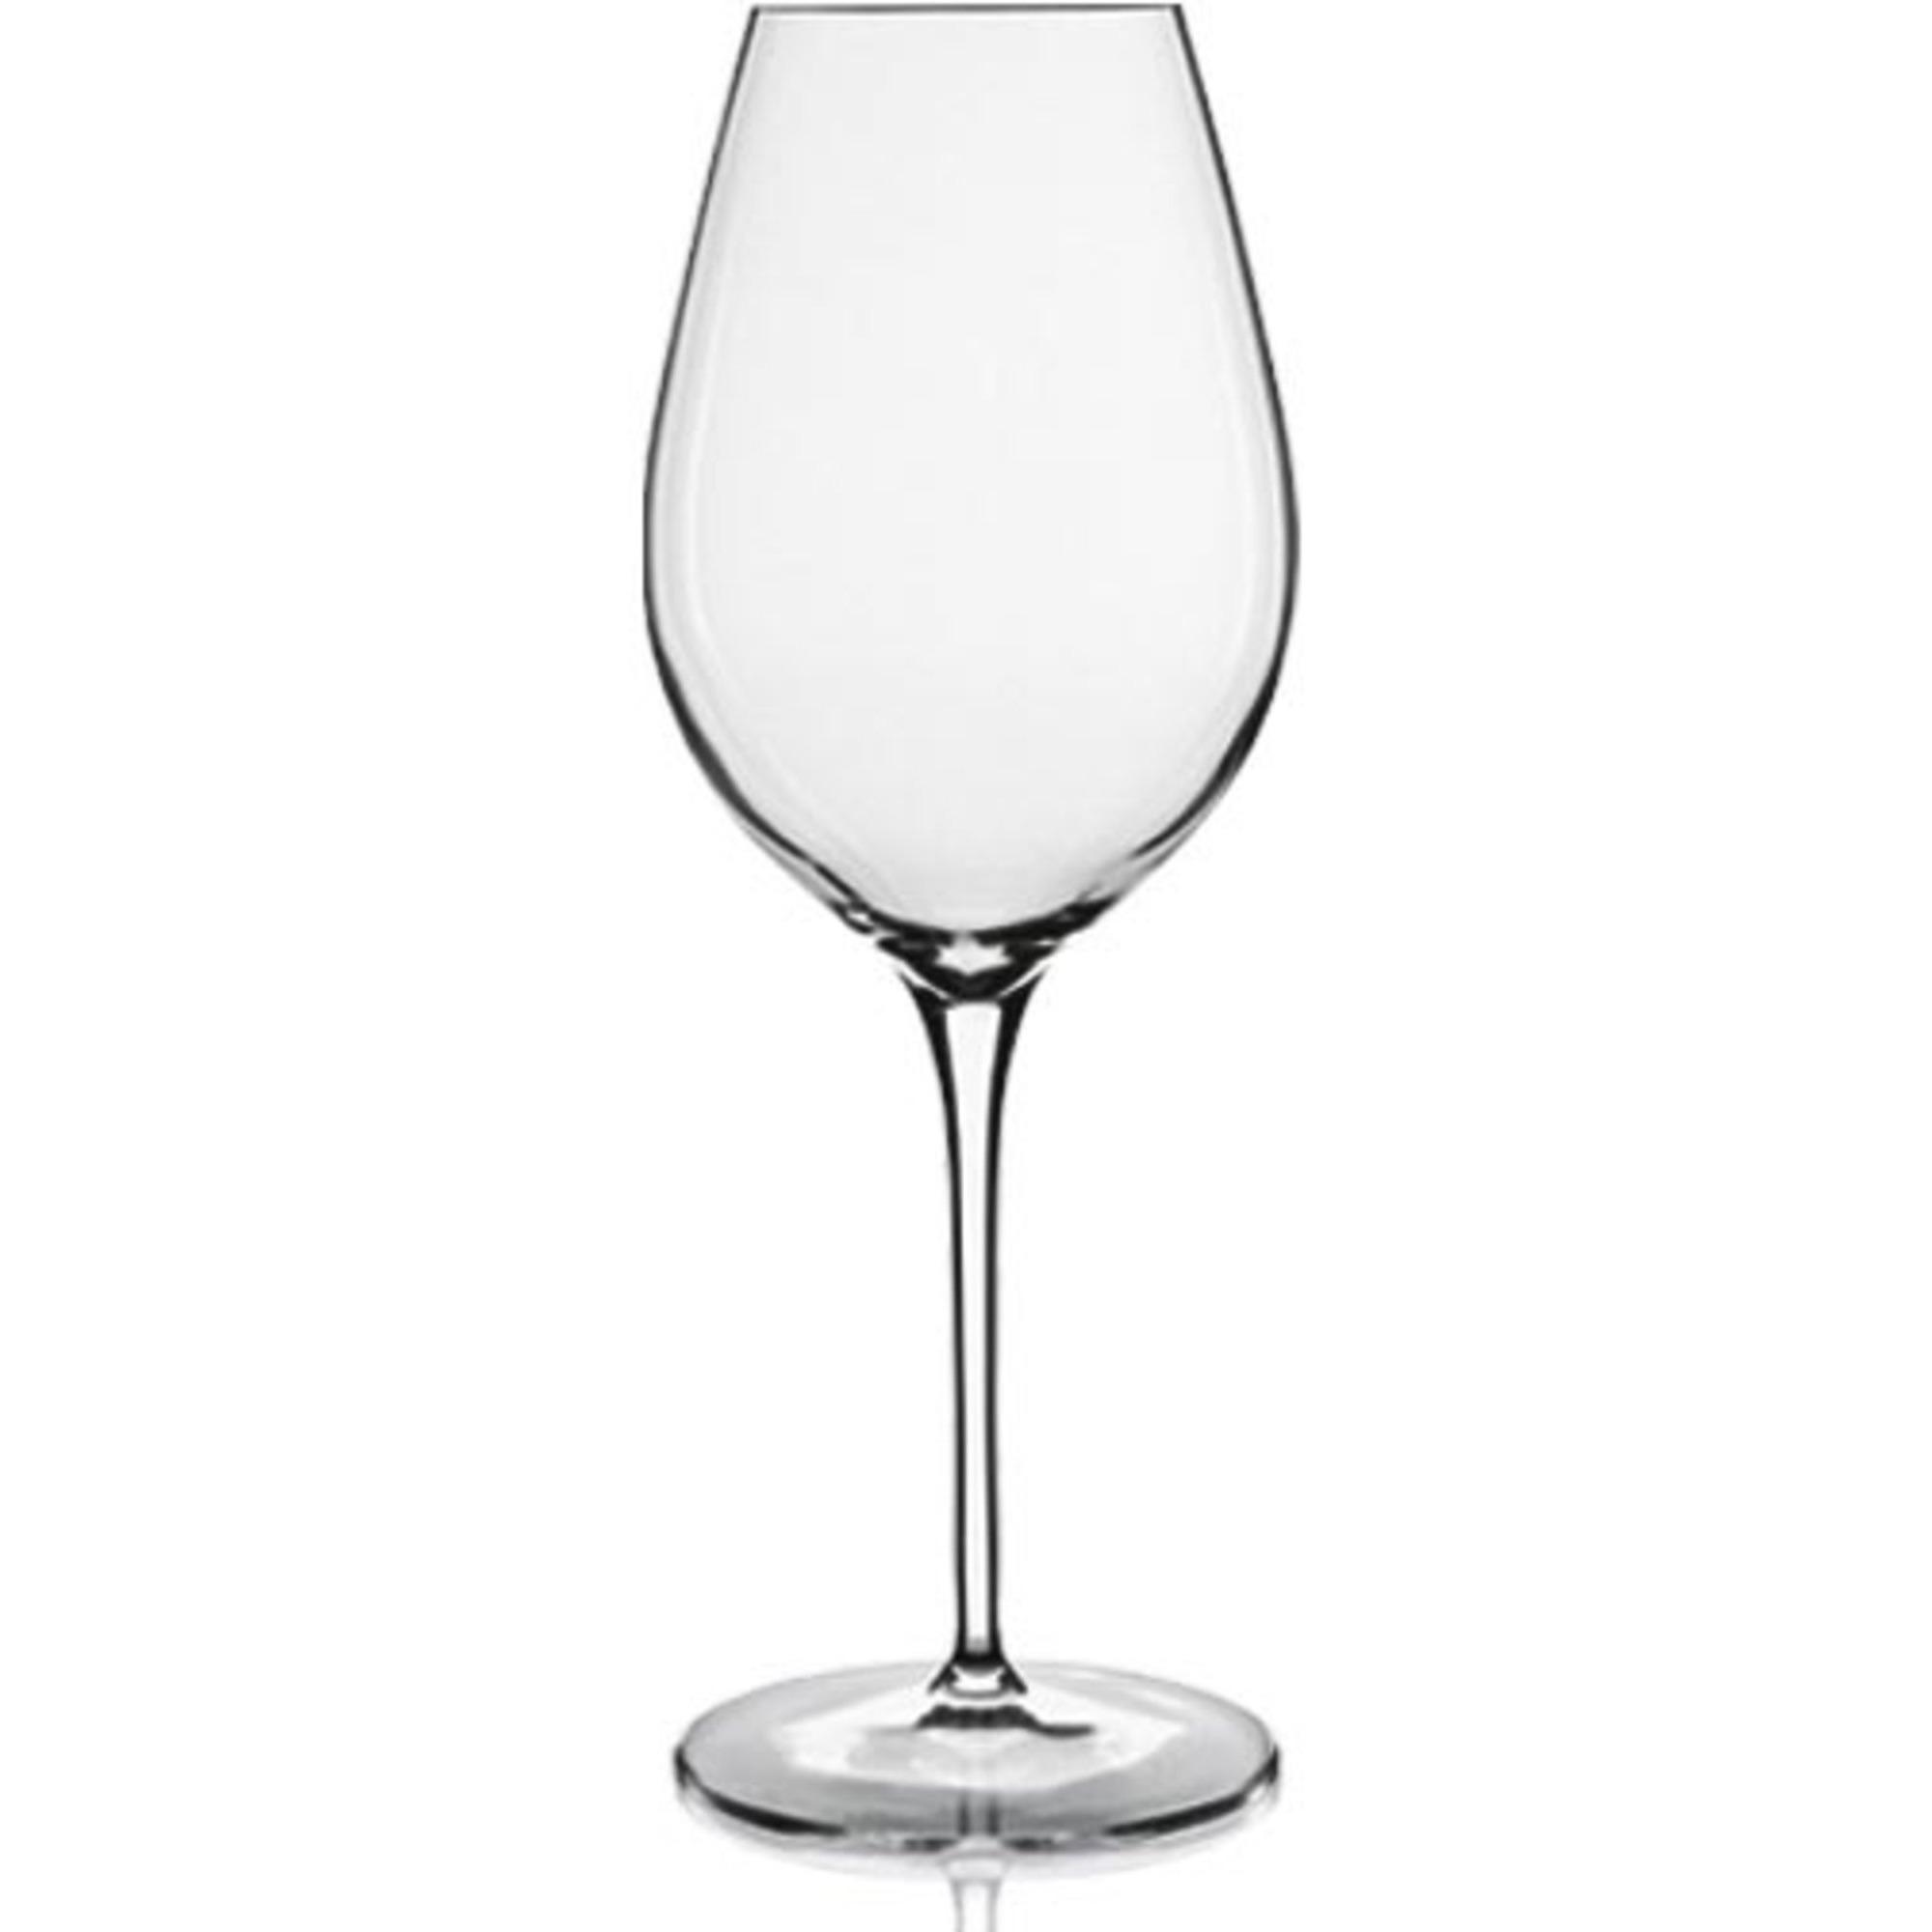 Luigi Bormioli Accademia Vinoteque 2 stk. Maturo Vitvinsglas